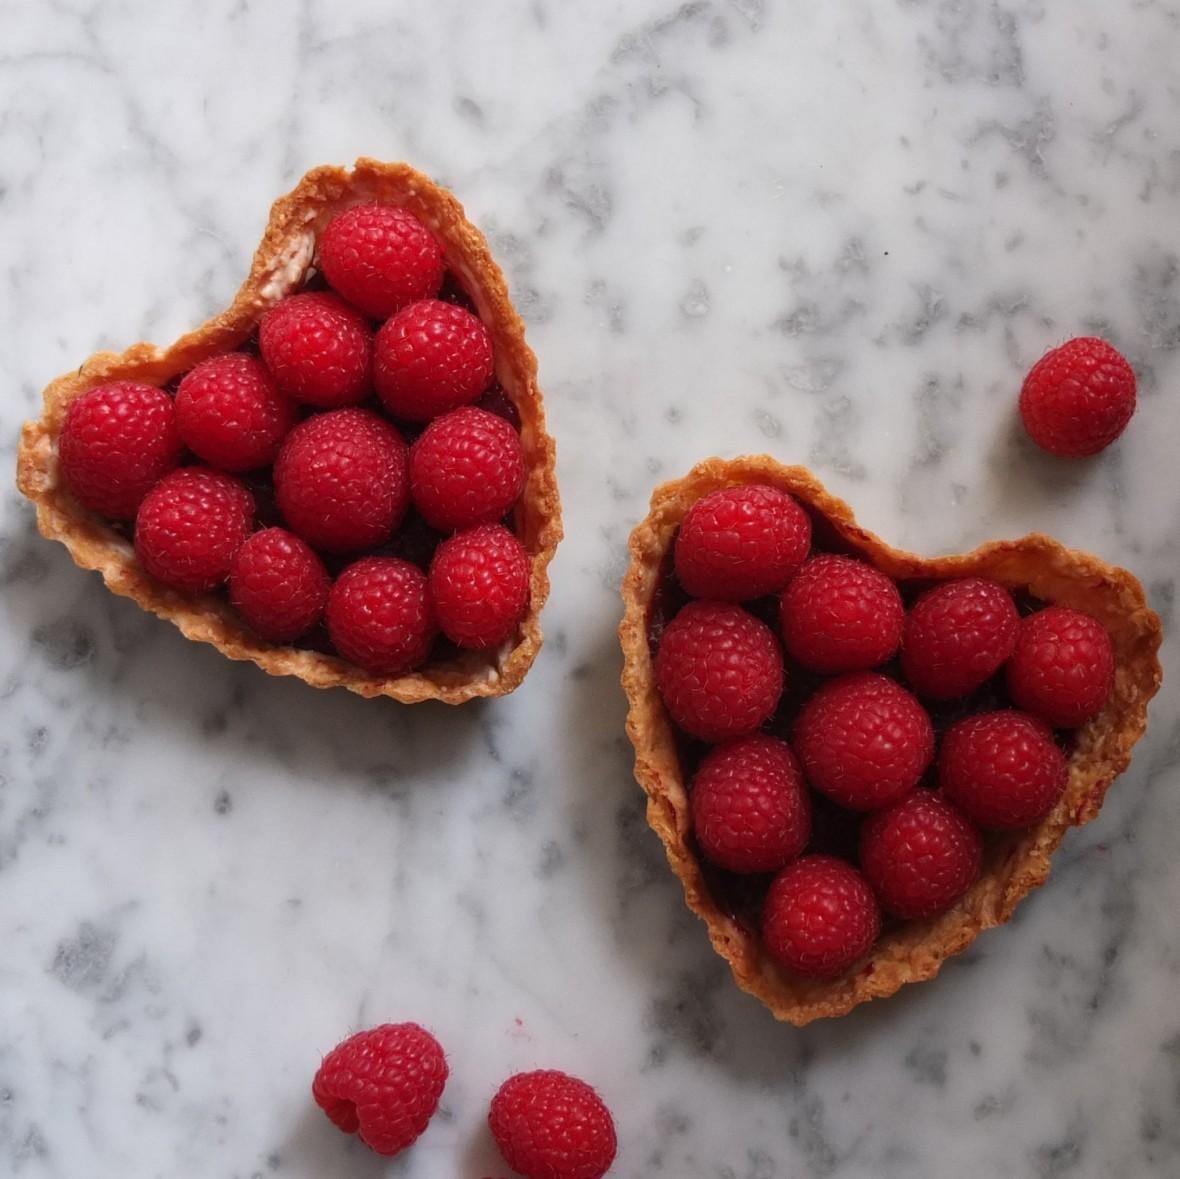 Healthier raspberry tart with vegan blackcurrant curd